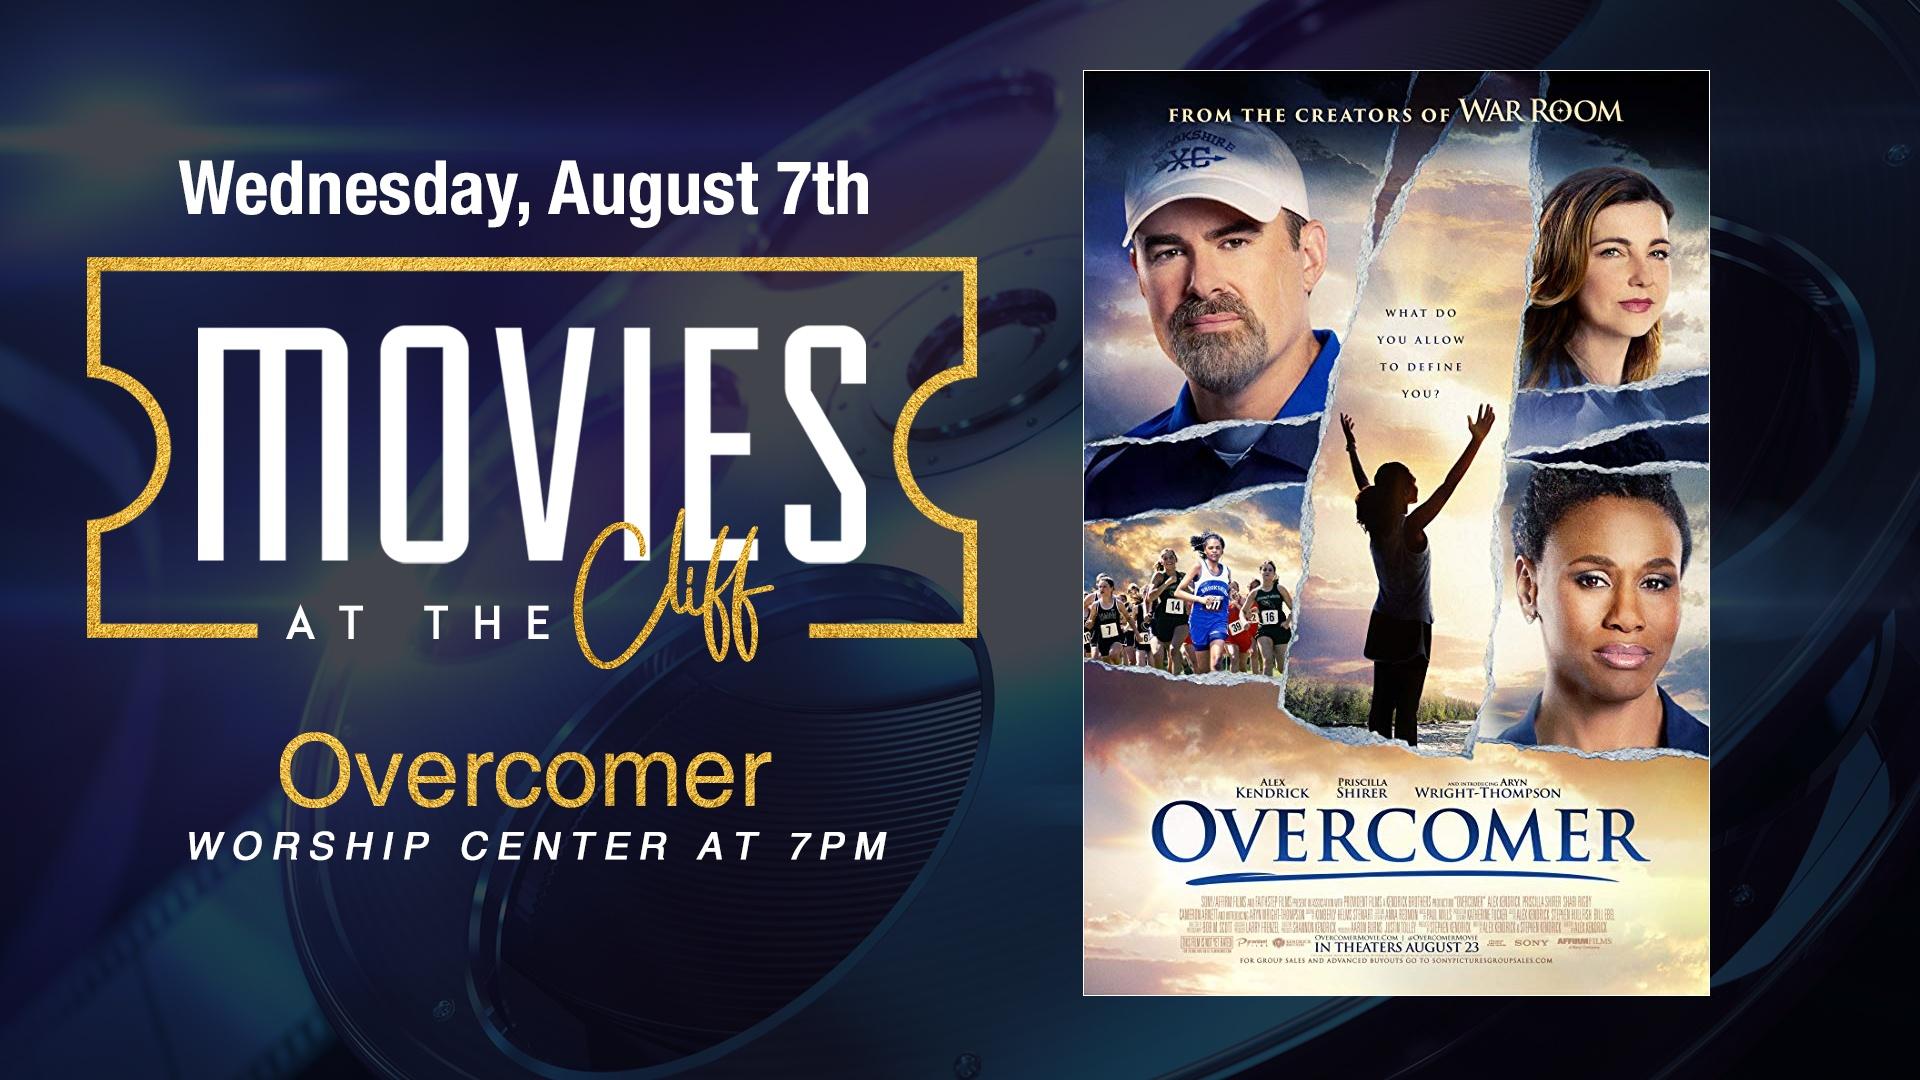 Watch Overcomer at OCBF